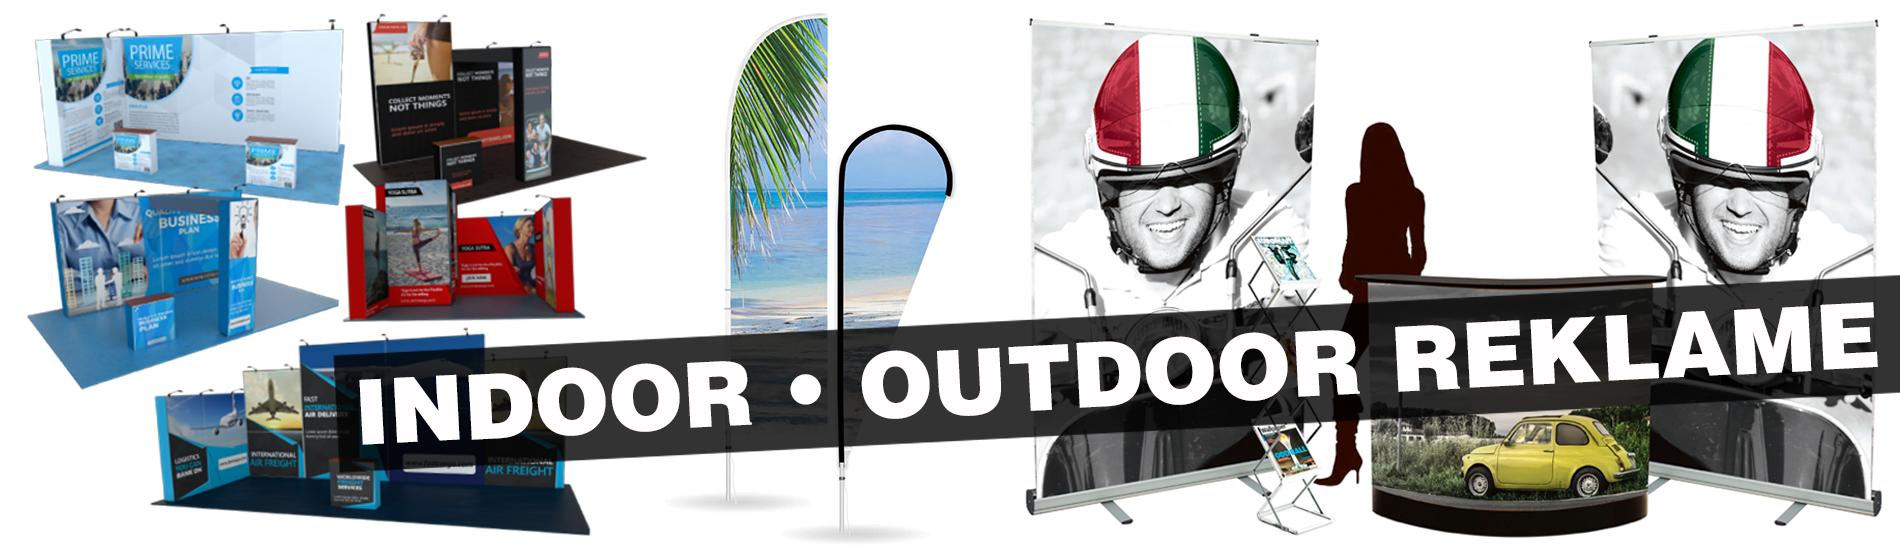 "<a href=""https://www.aarsbogtryk.dk/indoor-outdoor-reklamer/""></a><br/><p>"